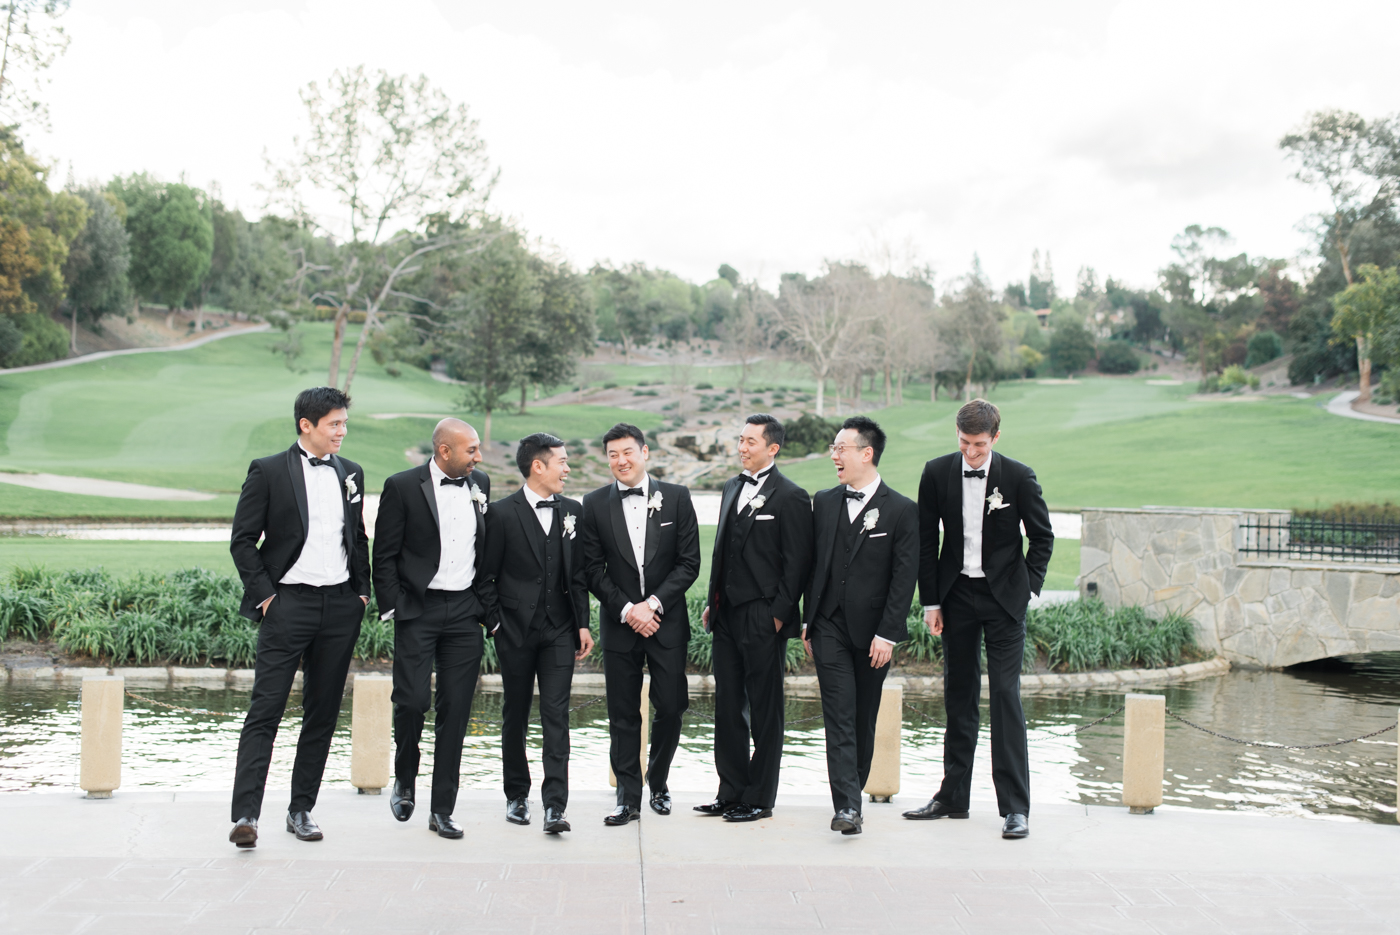 Friendly_Hills_Country_Club_fine_art_wedding_photographer_los_angeles_paris-20.jpg